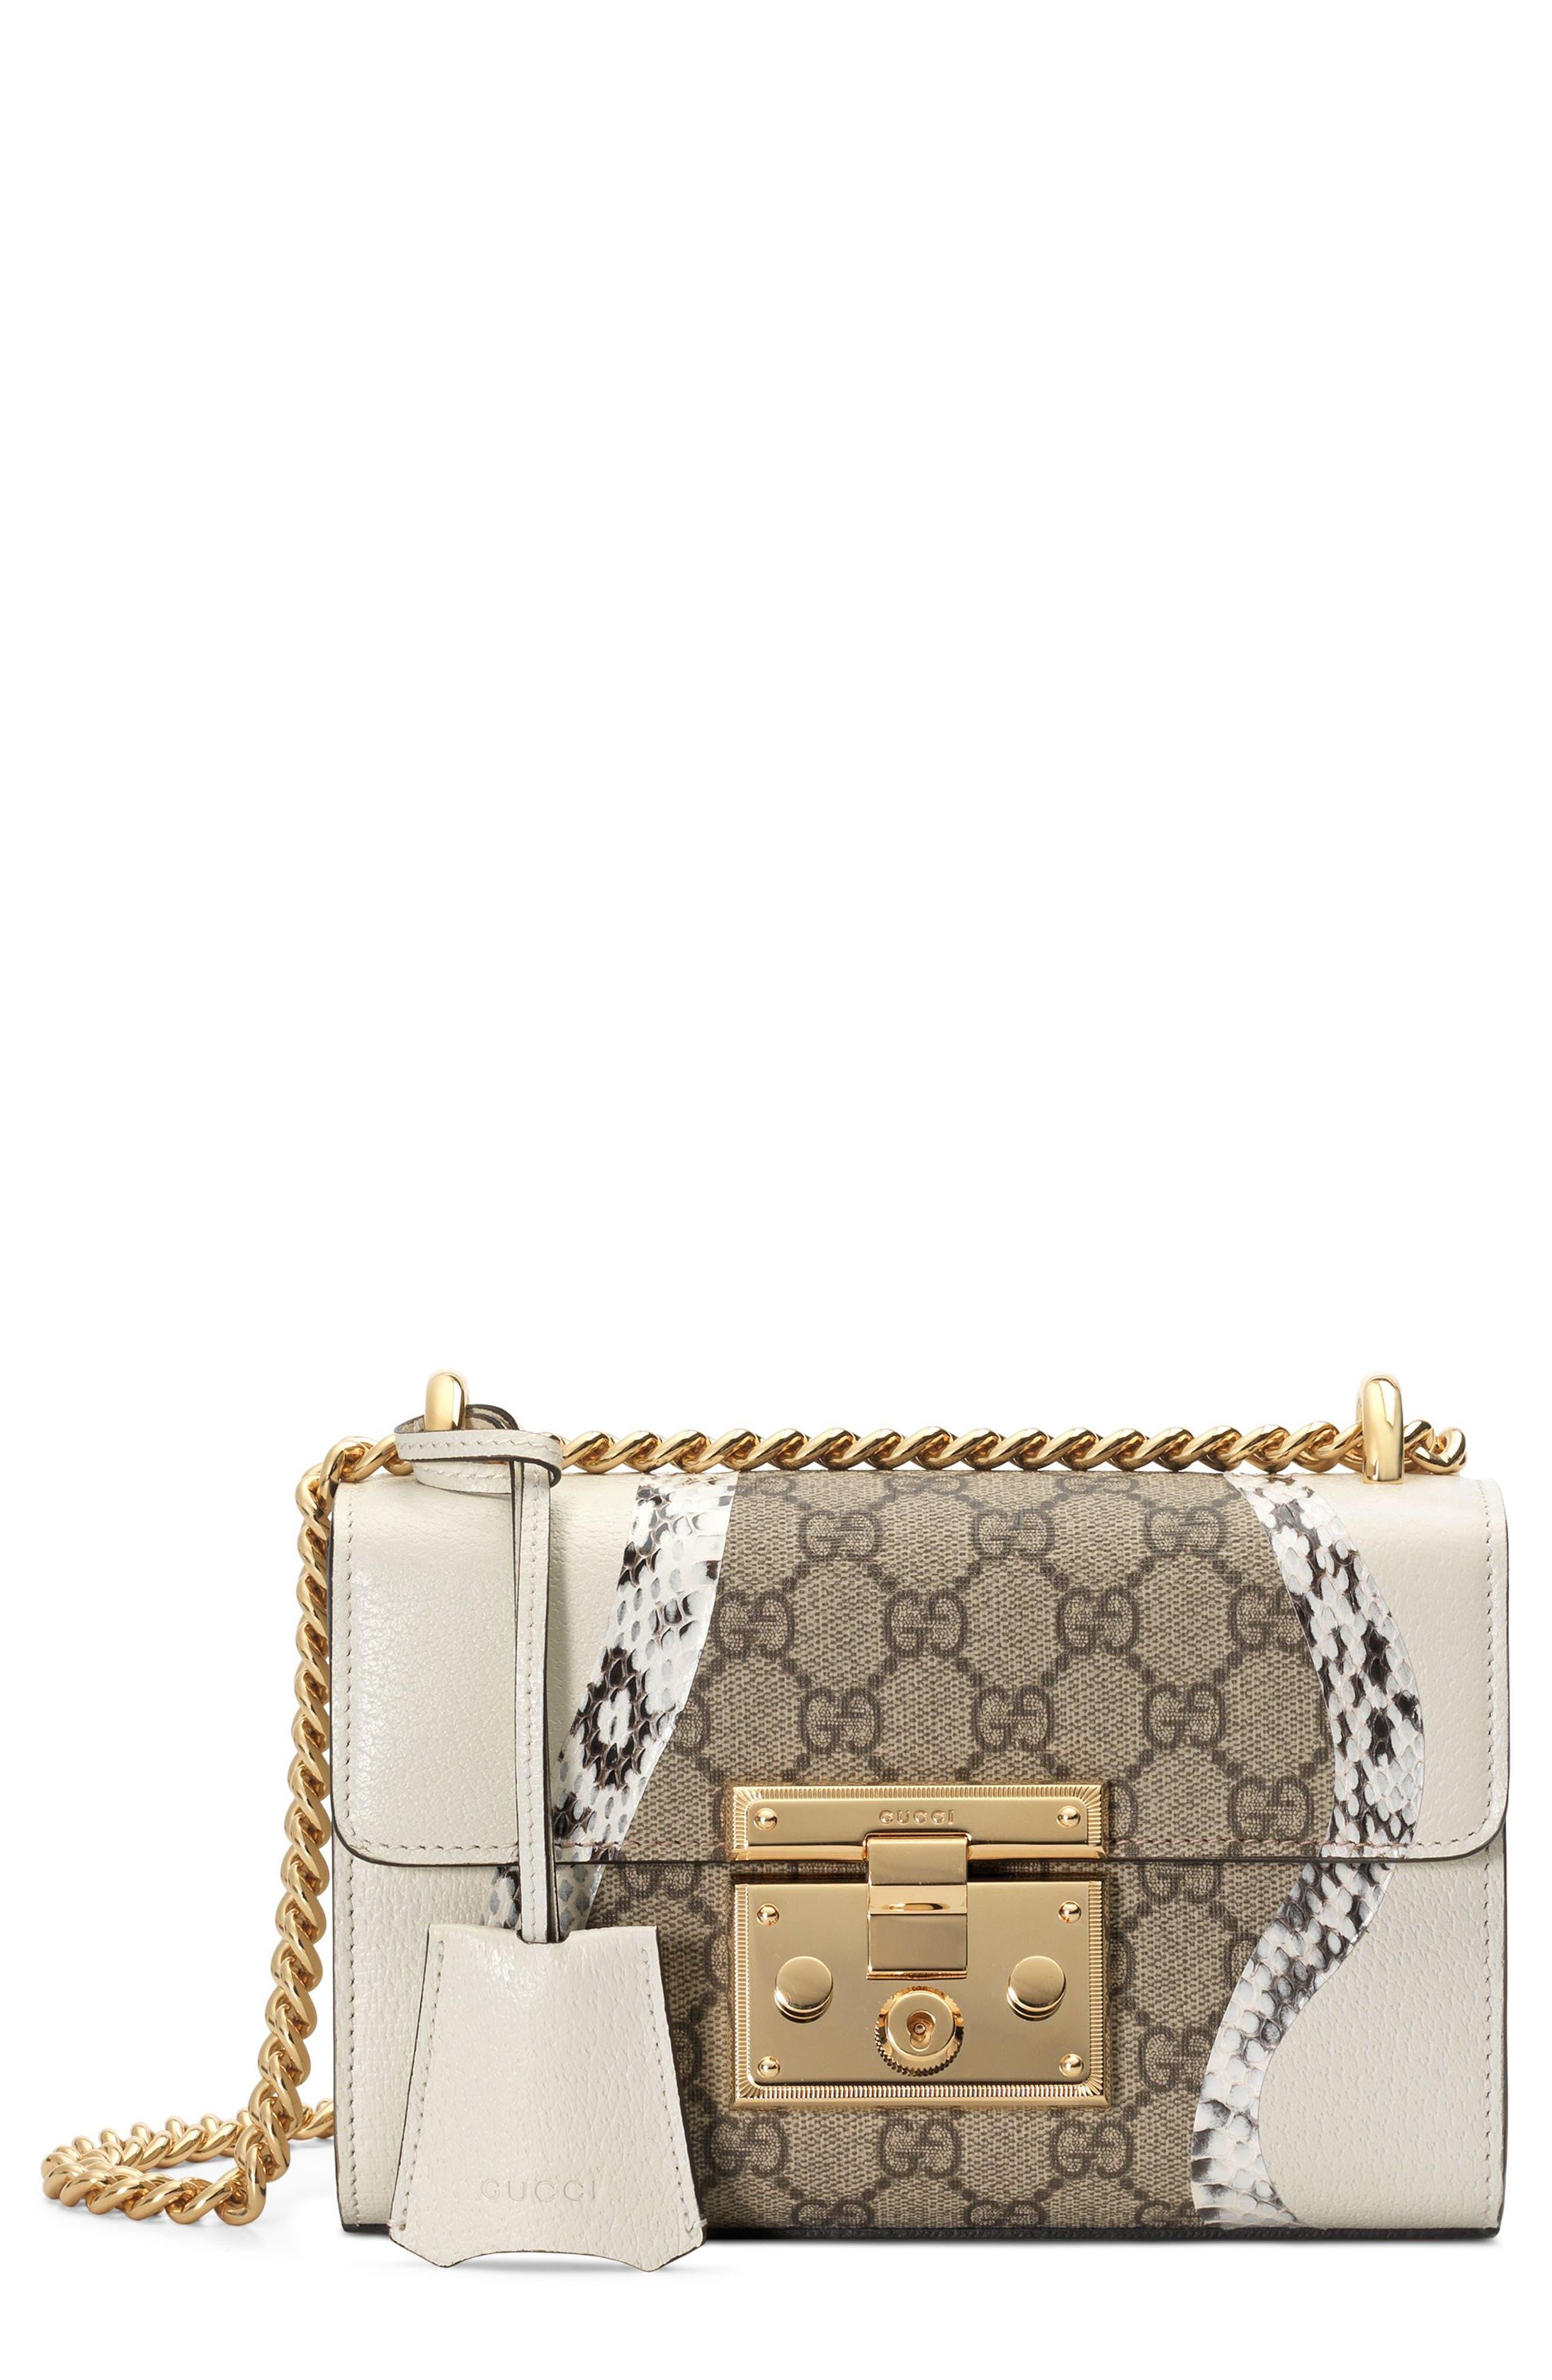 Small Padlock GG Supreme Wave Shoulder Bag with Genuine Snakeskin Trim,                         Main,                         color, White/ Roccia/ Beige Ebony